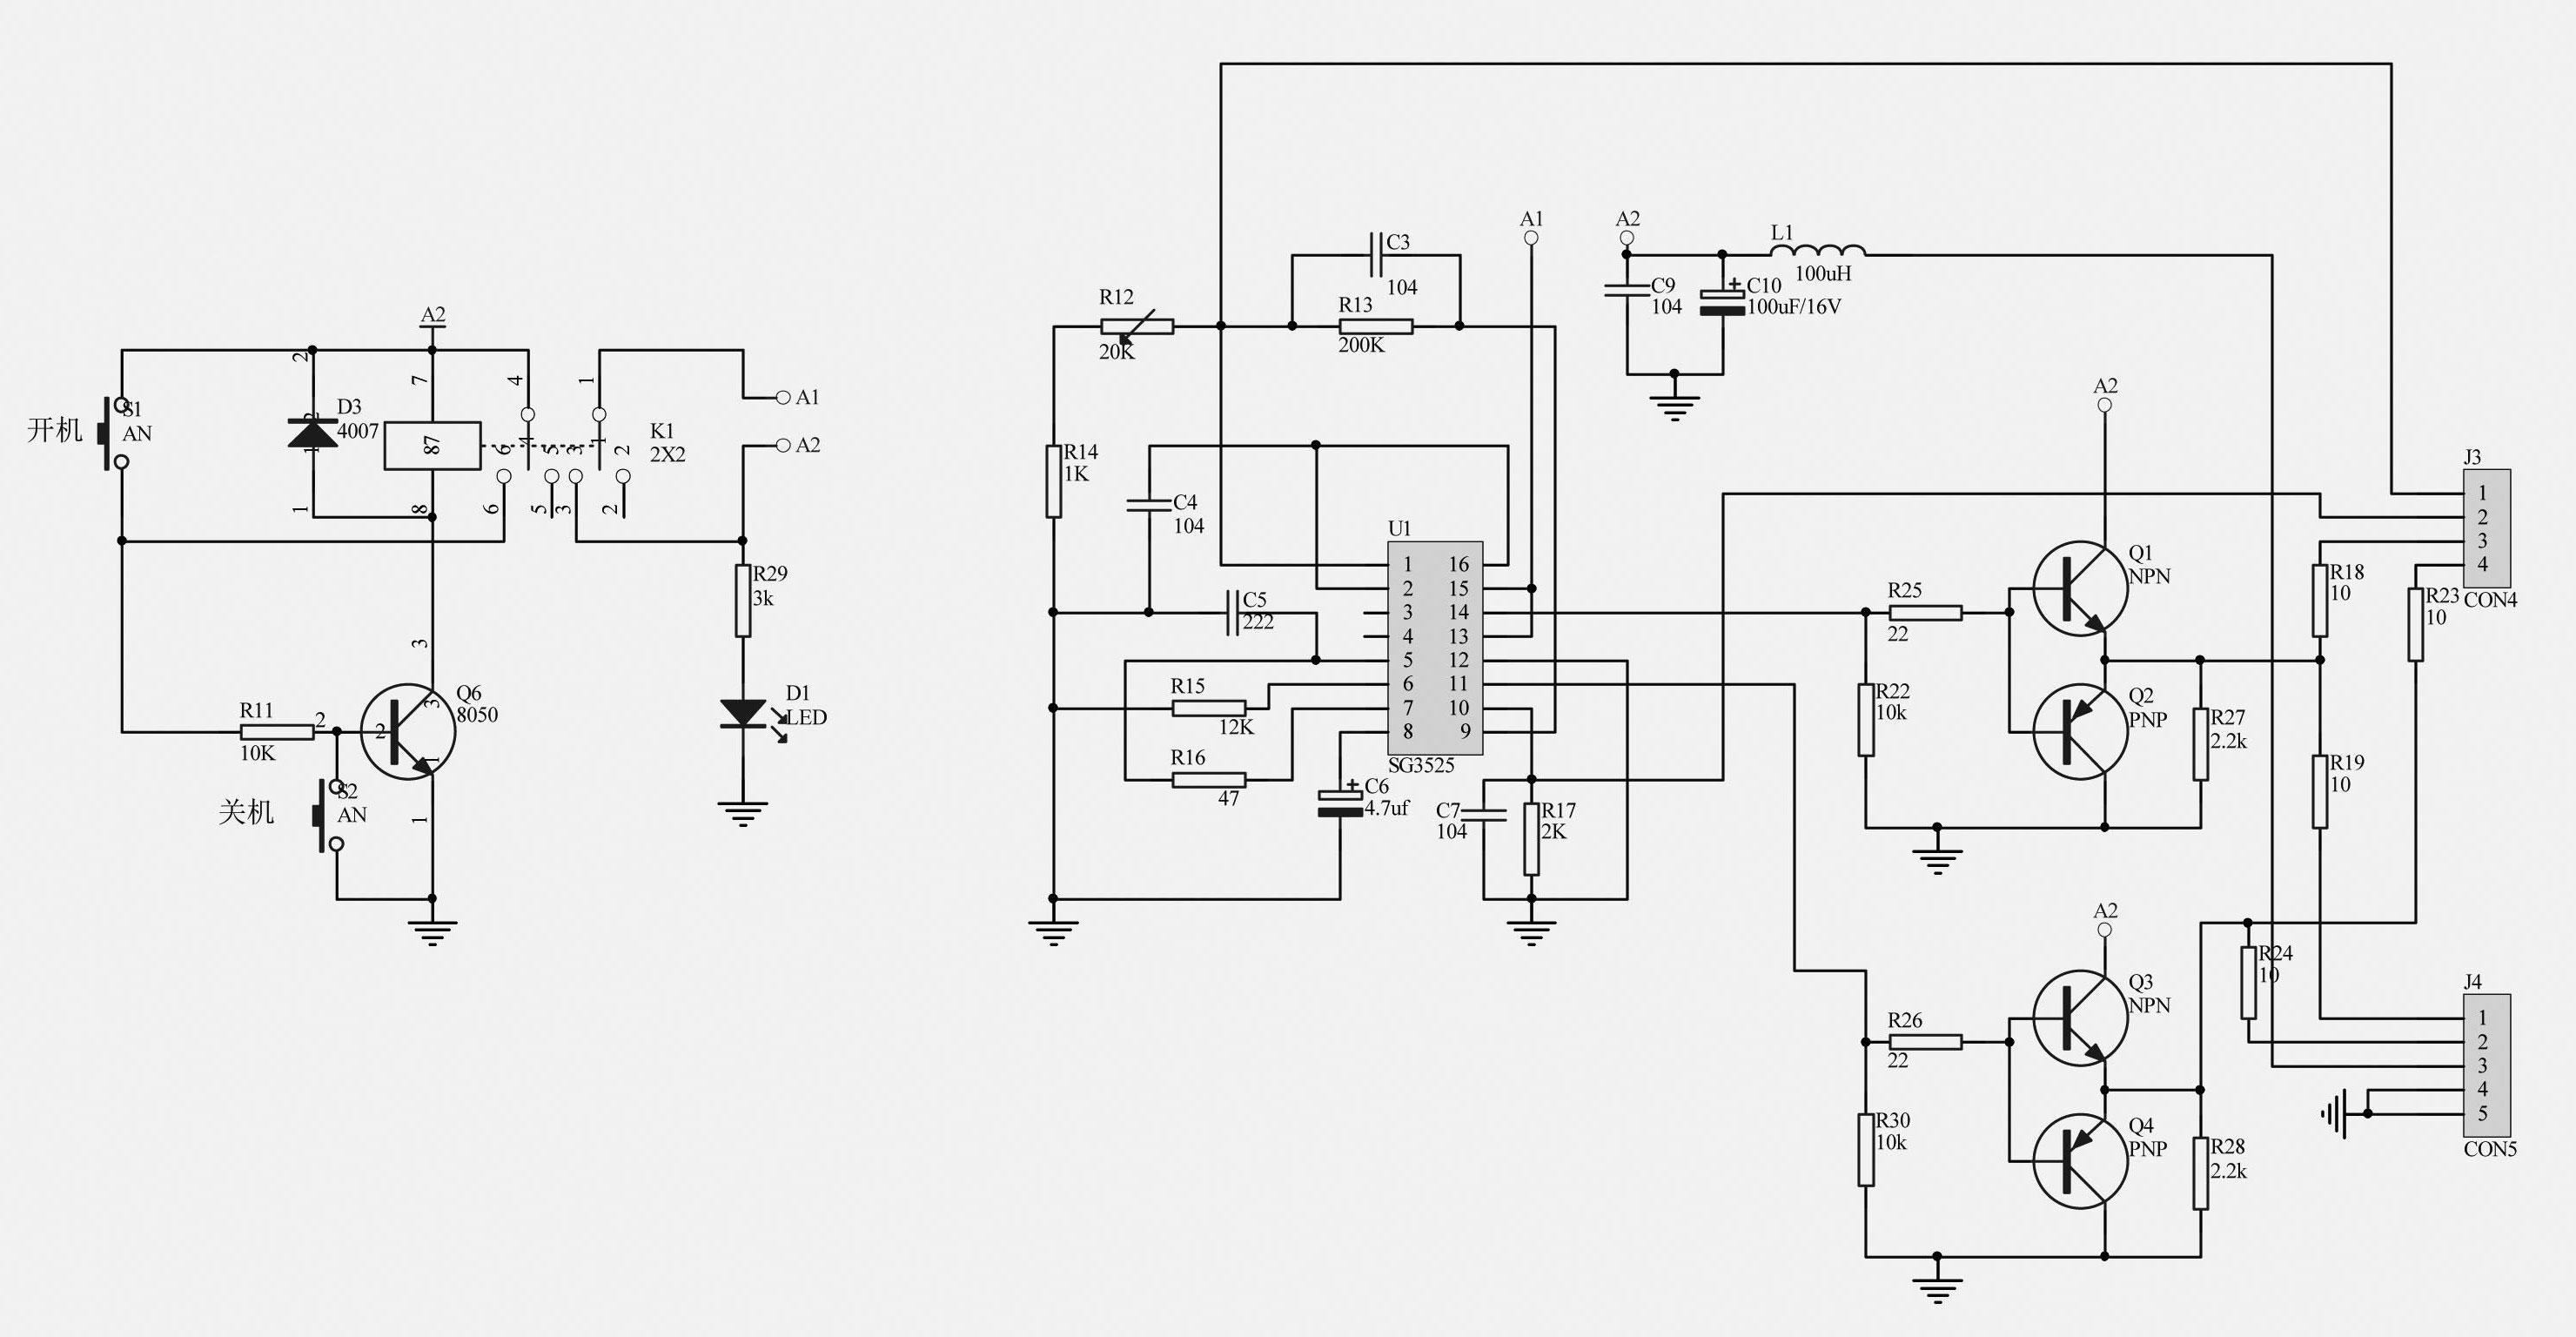 Peachy E88 Wiring Diagrams Wiring Library Wiring Cloud Grayisramohammedshrineorg